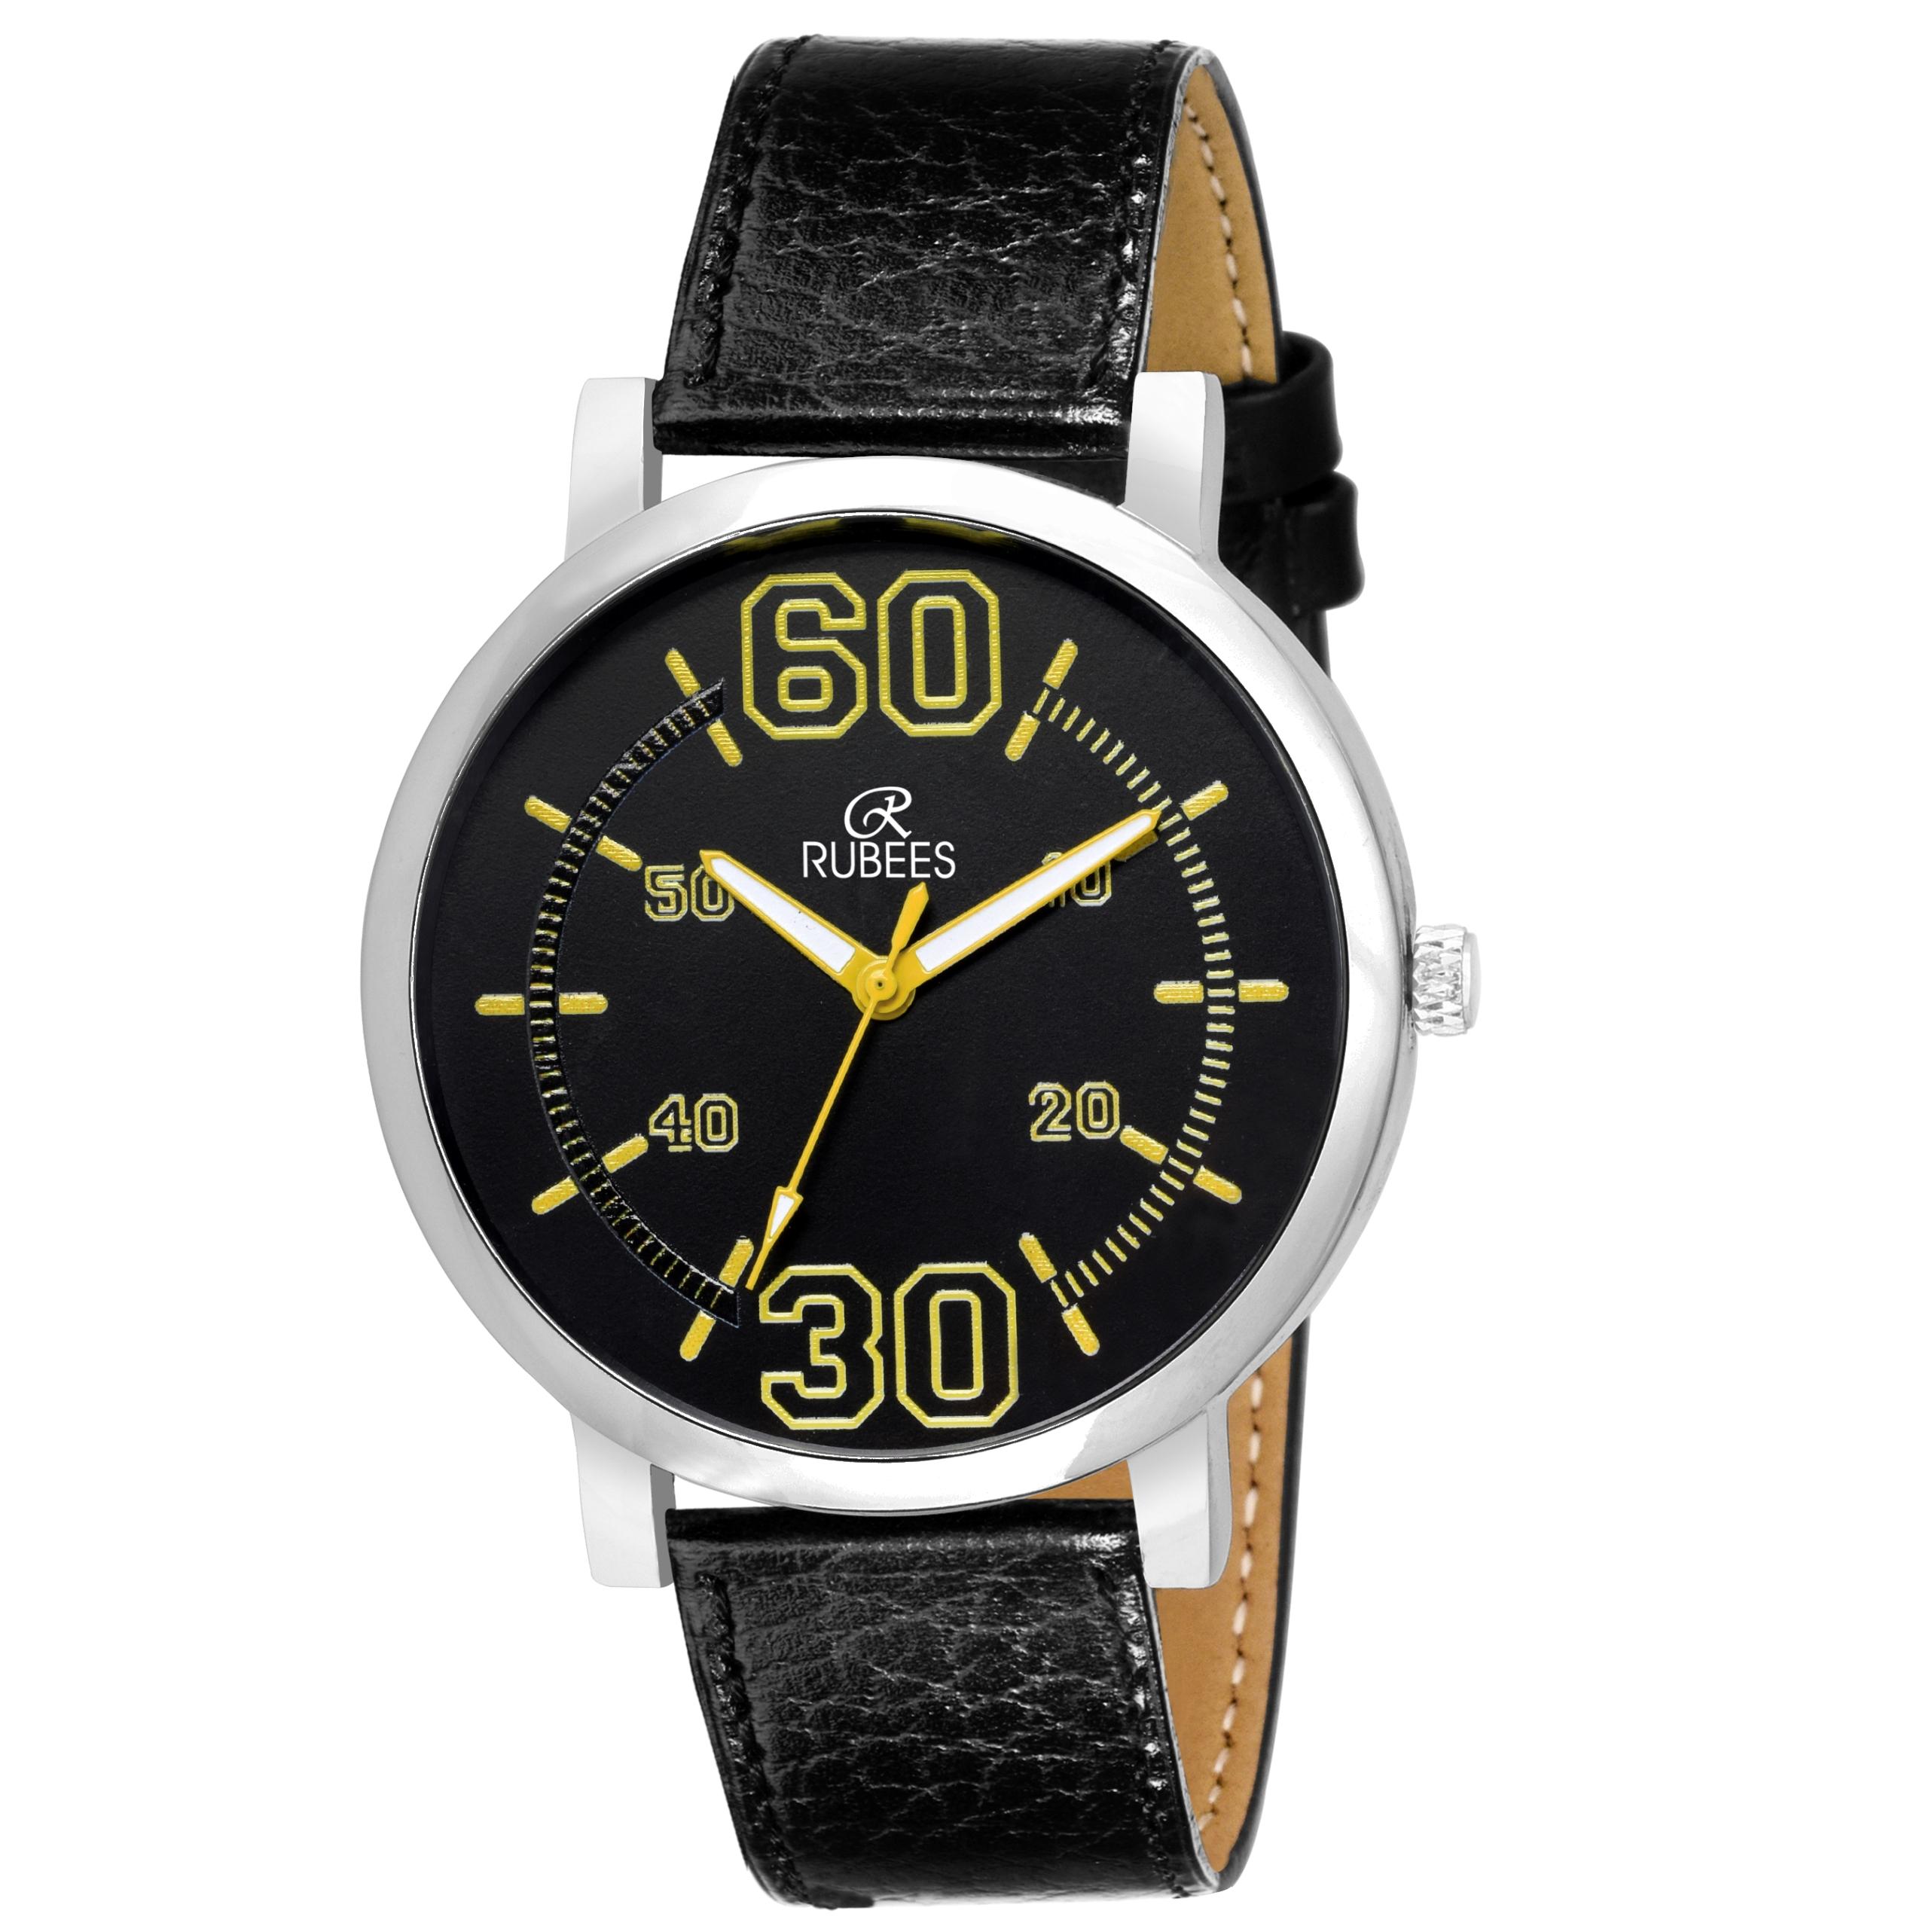 Rubees Analog Watch